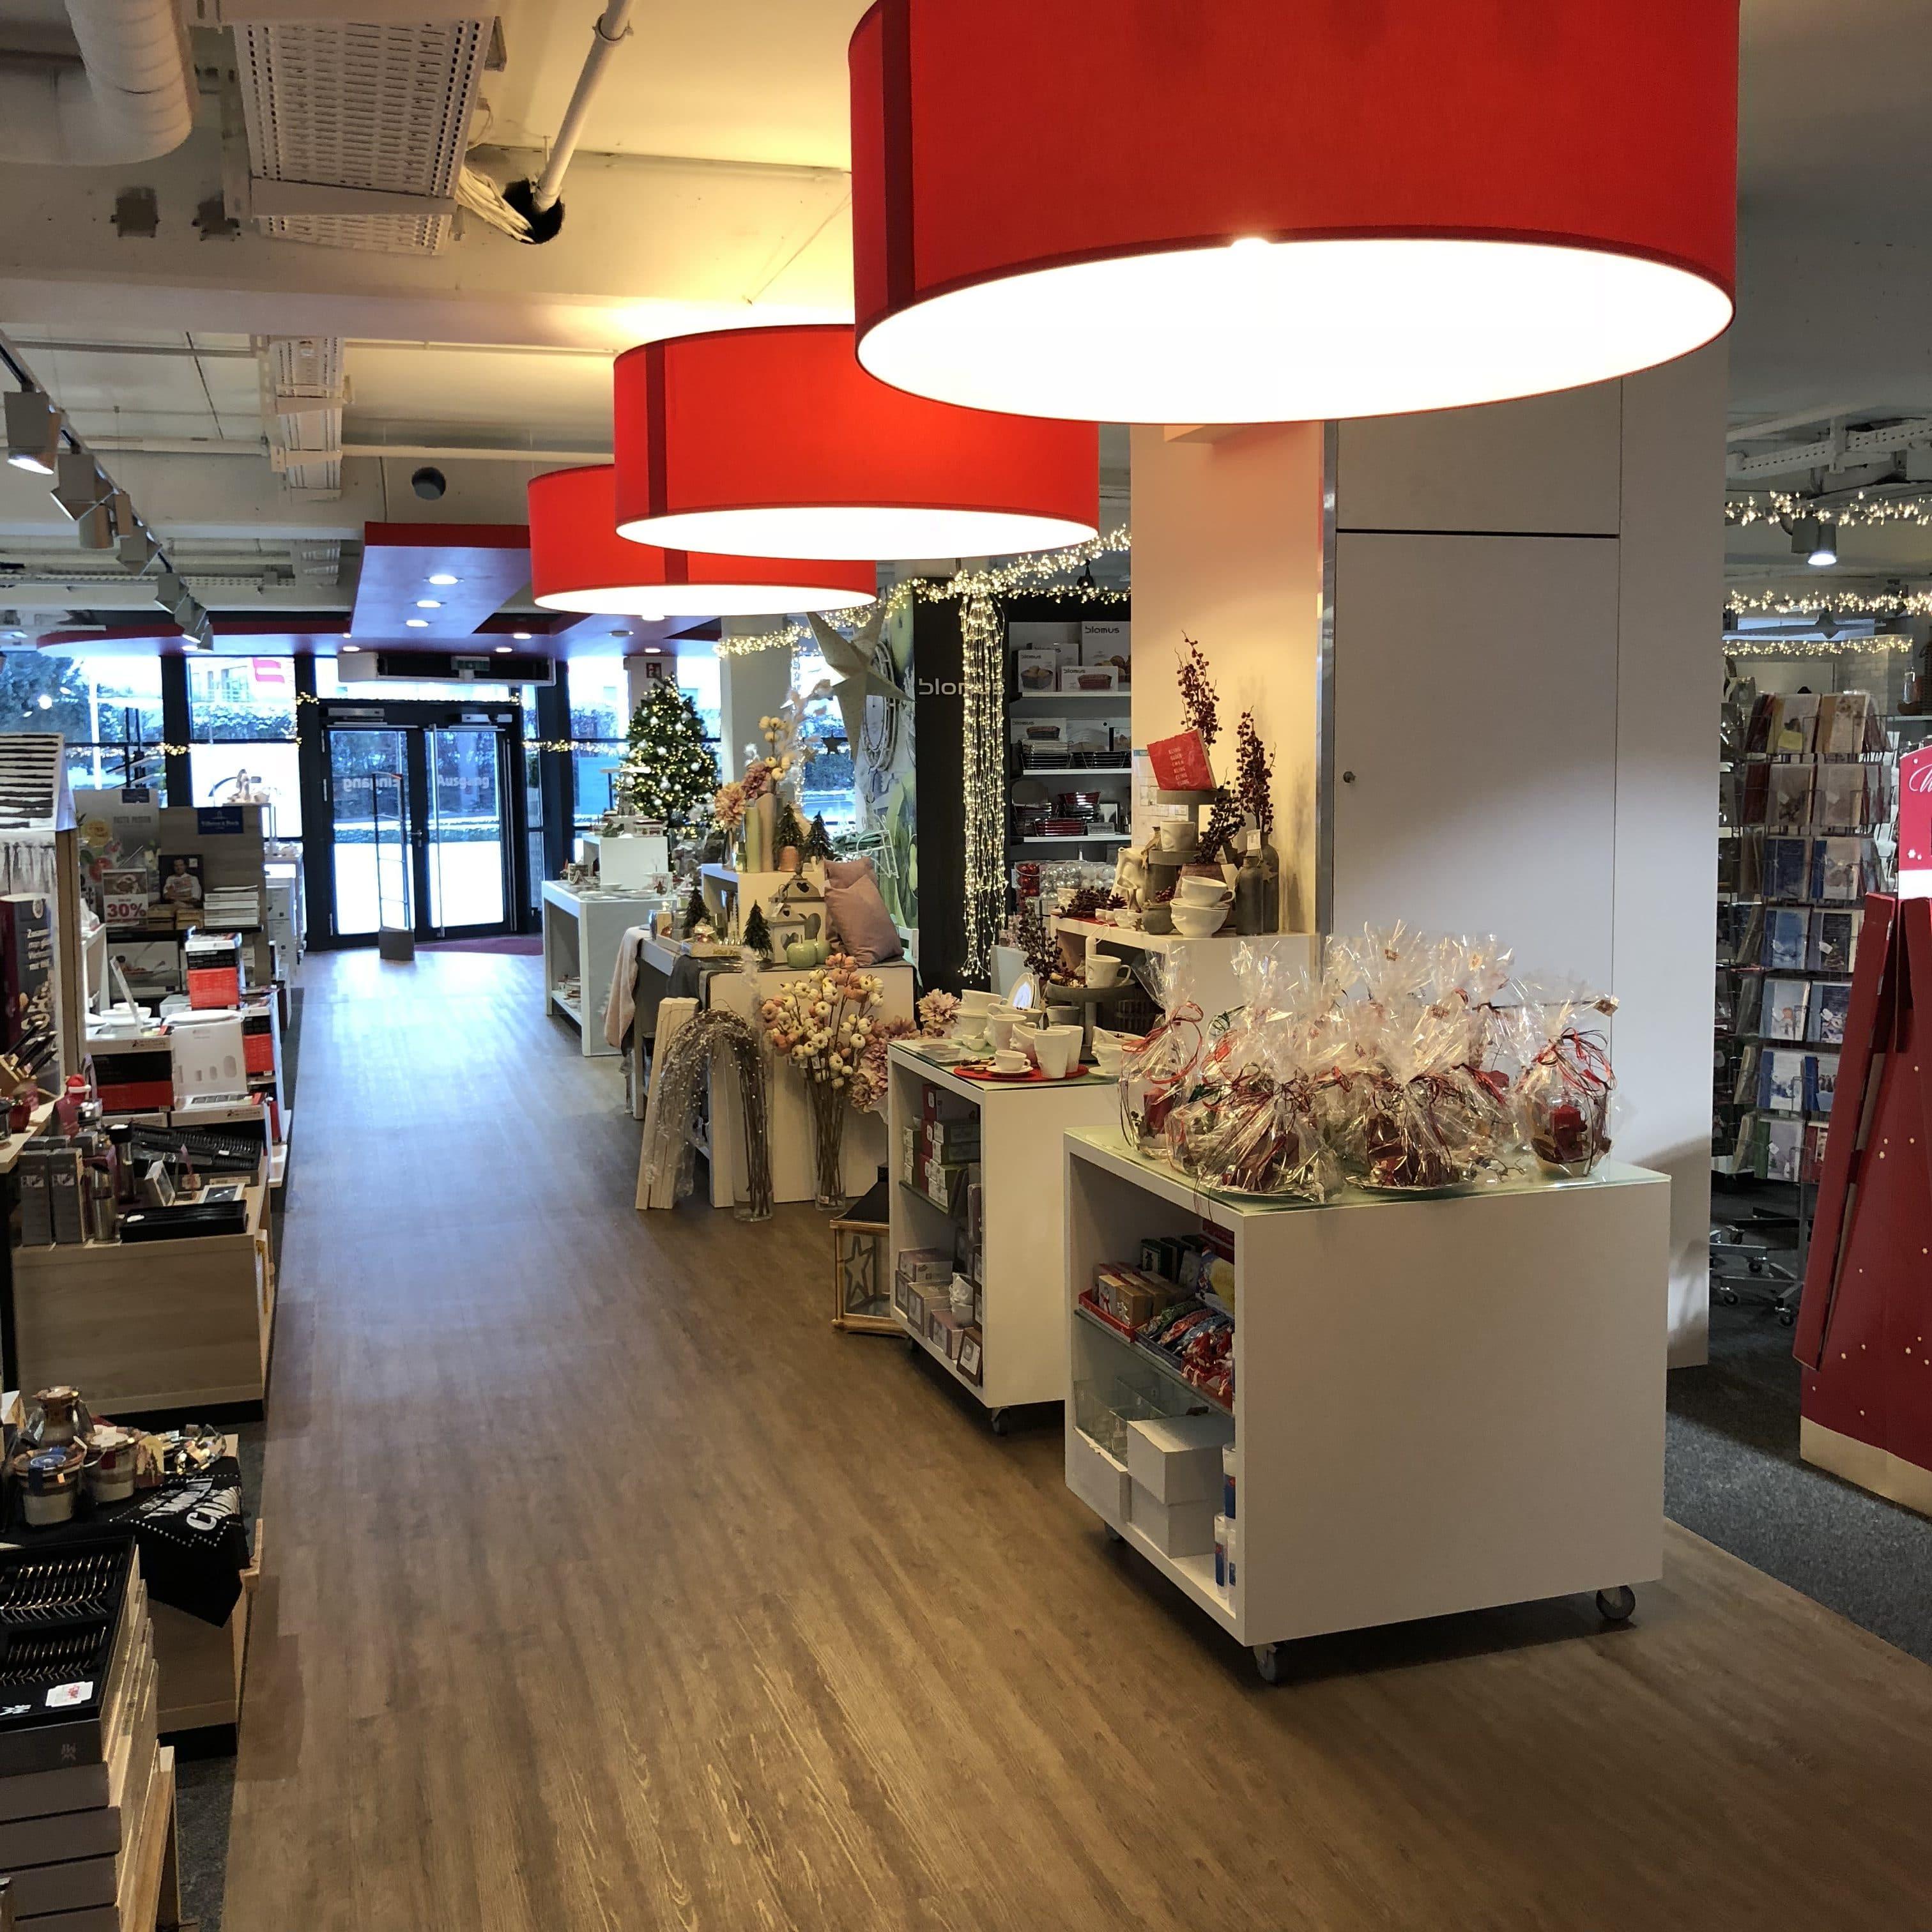 260911bcdaa3fc Boutique - Möbel Urban